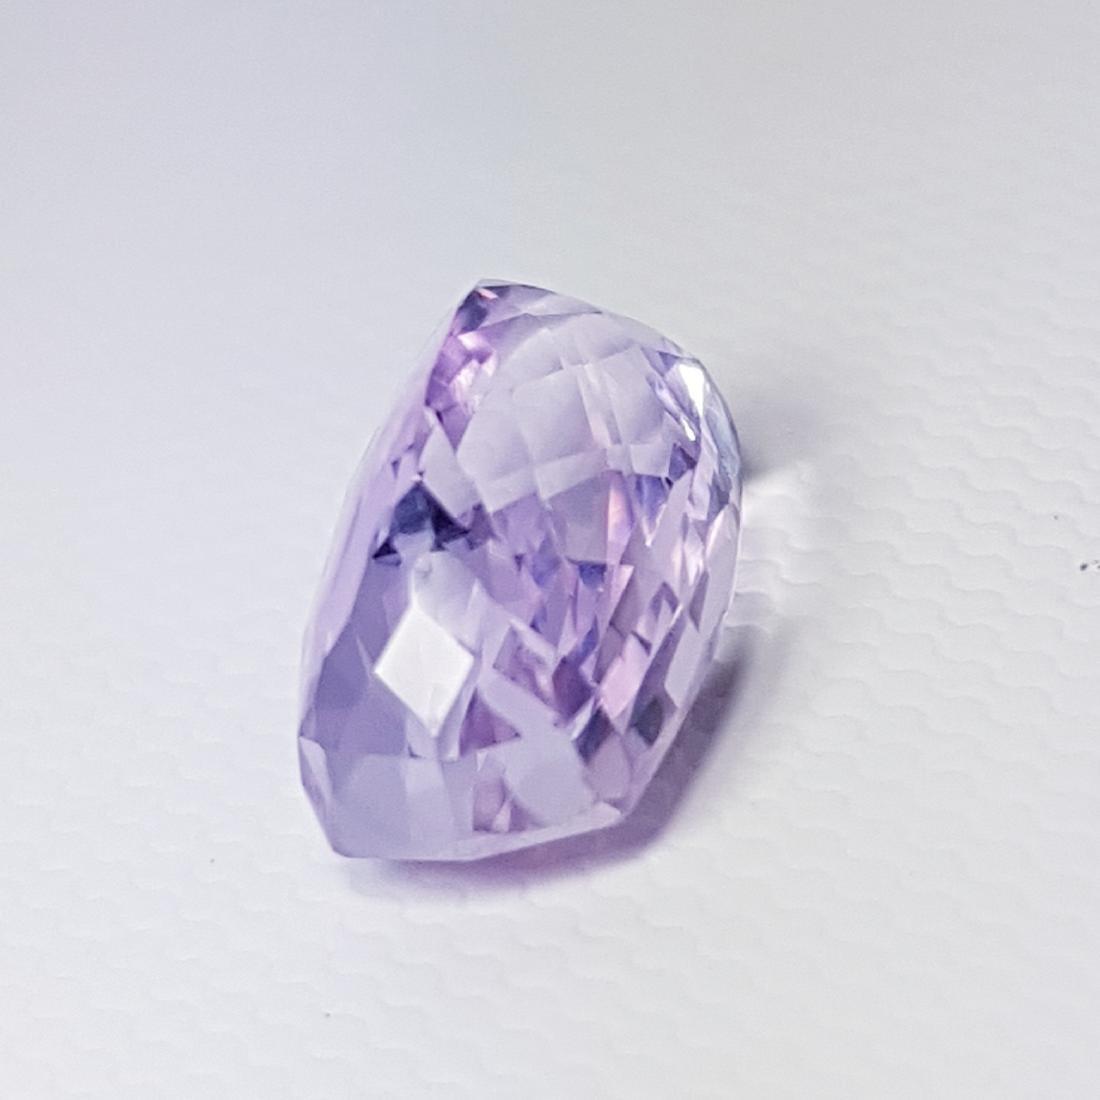 5.71 ct Collector Gem Natural Pink Kunzite - 4